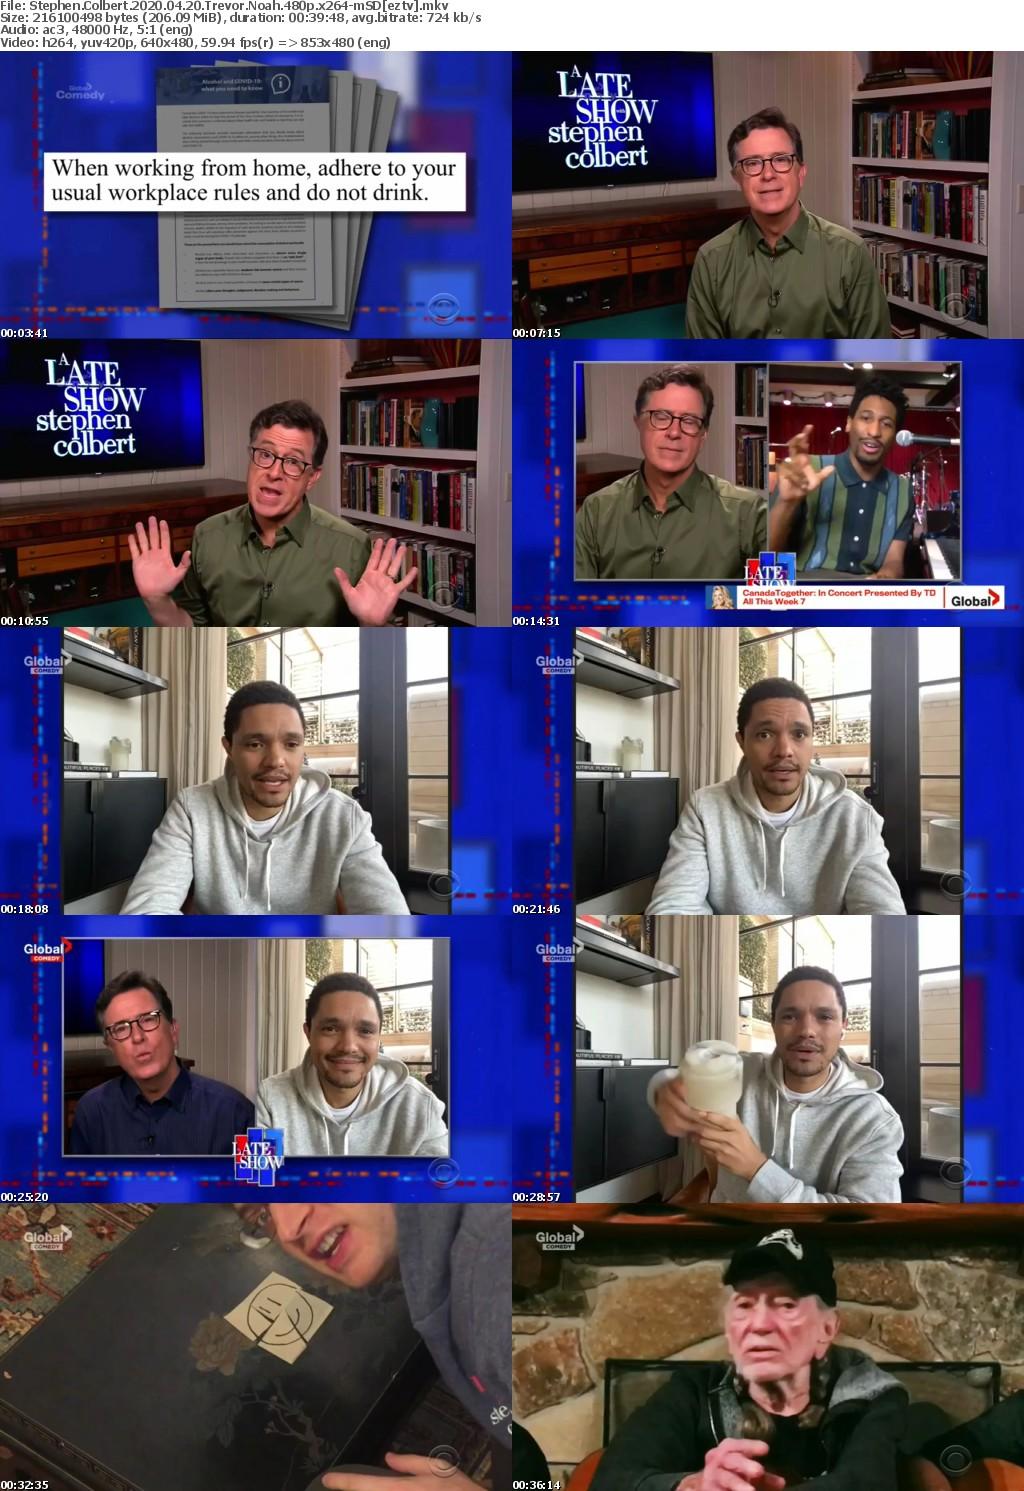 Stephen Colbert 2020 04 20 Trevor Noah 480p x264-mSD